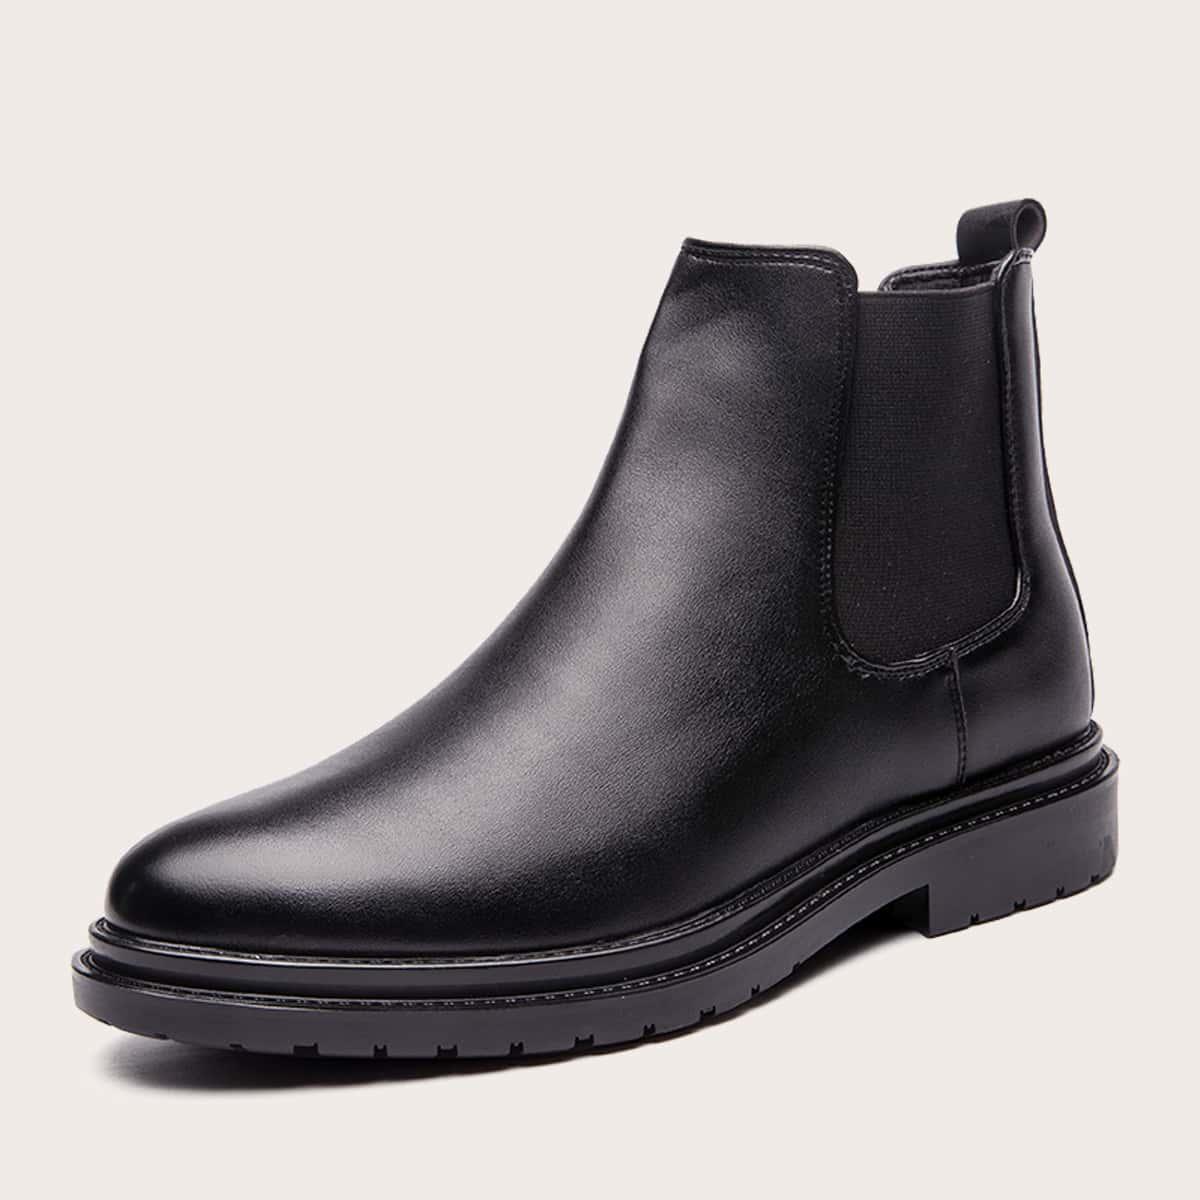 Мужские минималистские ботинки челси